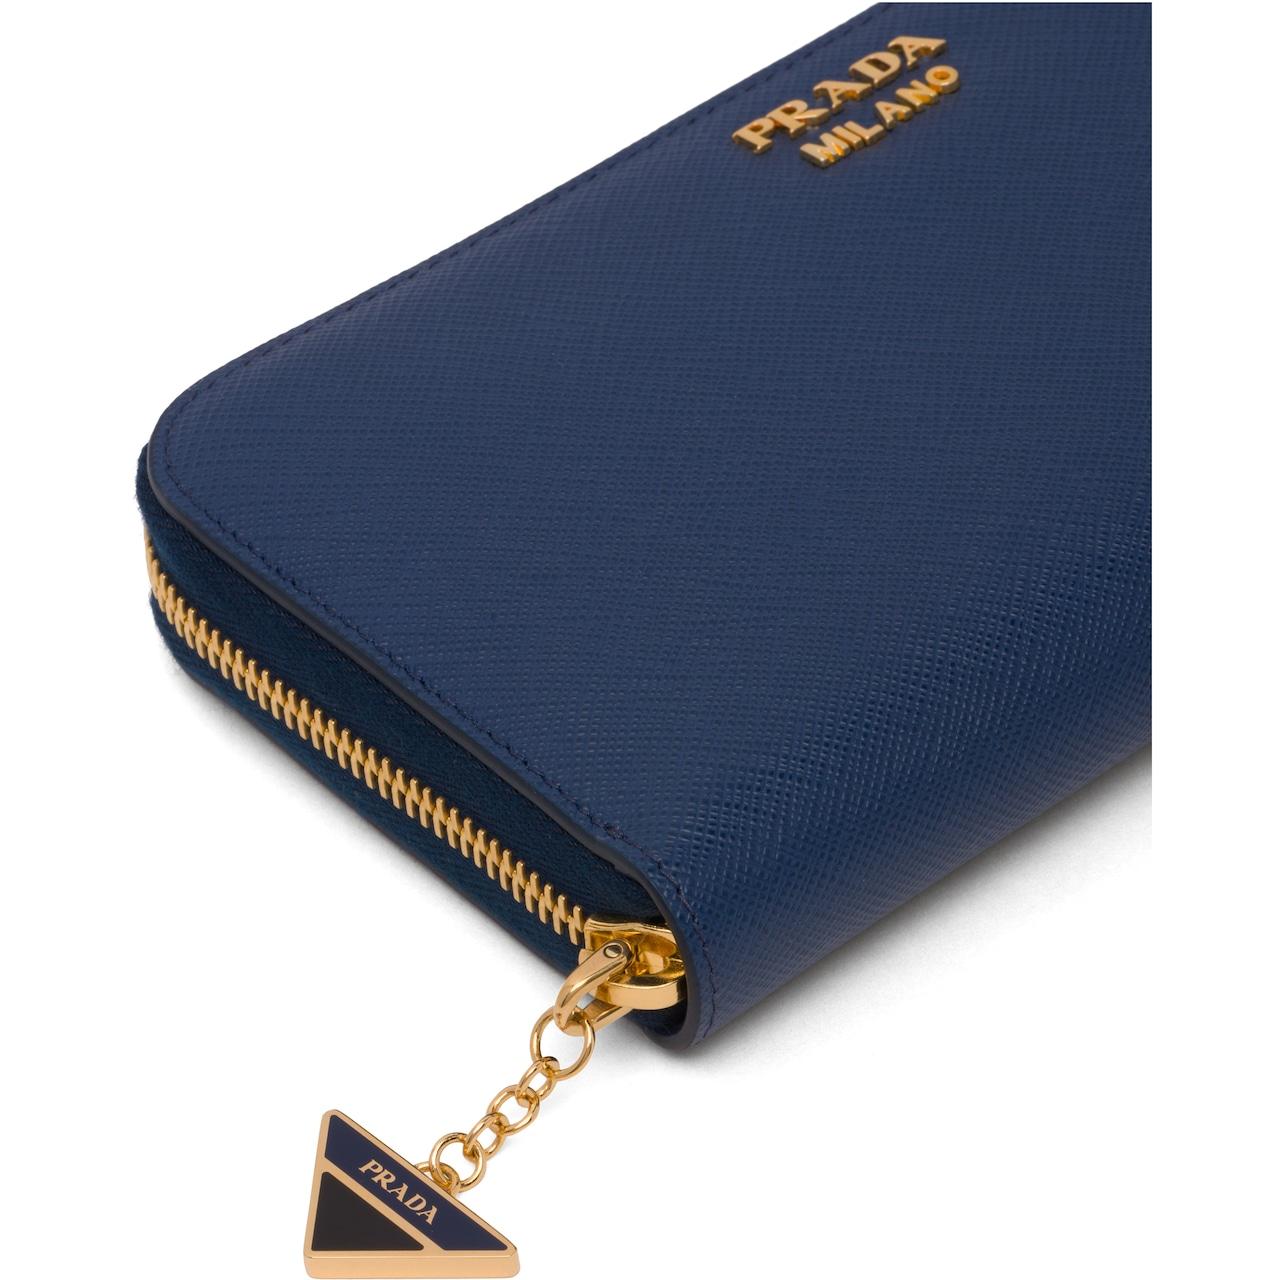 Prada Saffiano leather wallet 6